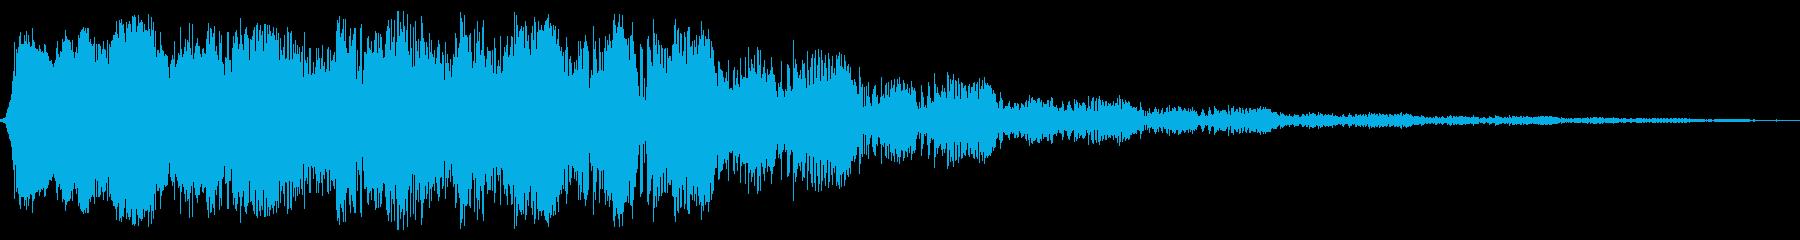 AMGアナログFX 49の再生済みの波形